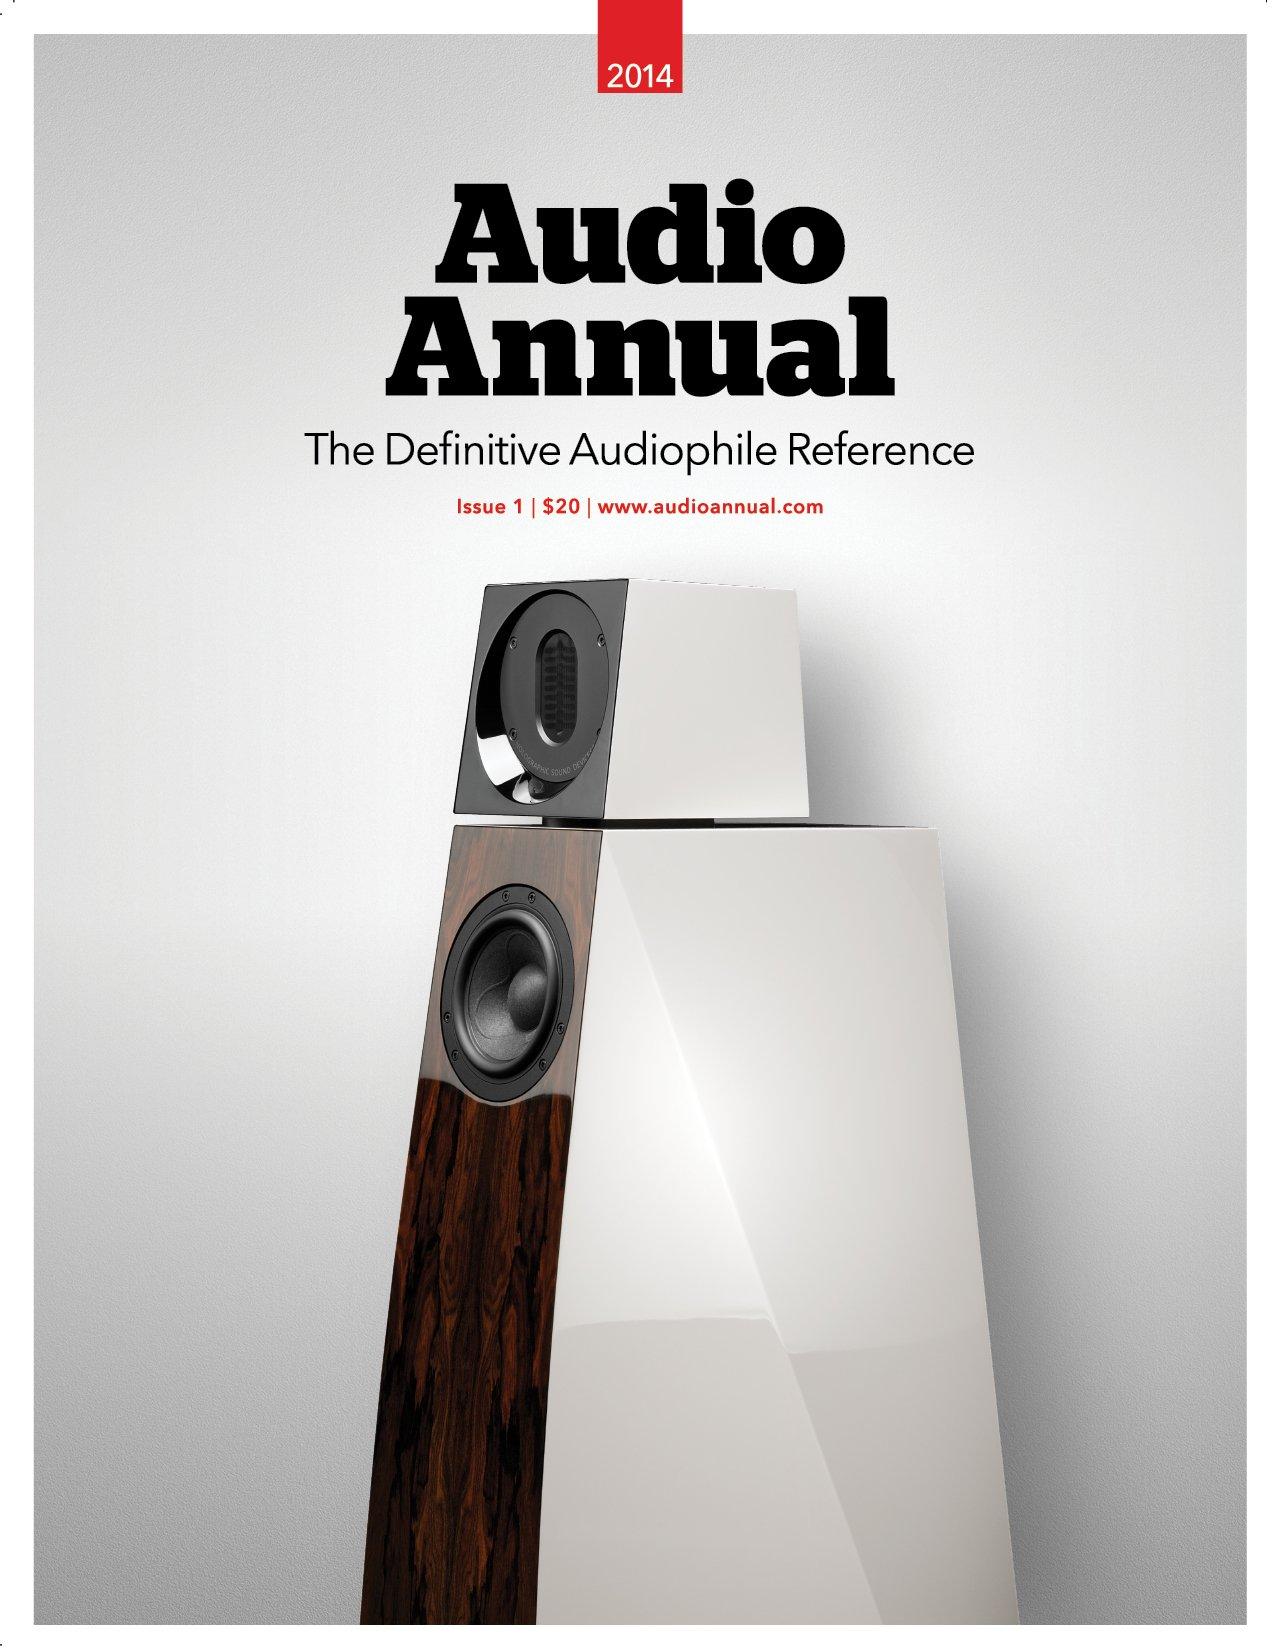 Audio Annual 2014: The Definitive Audiophile Reference pdf epub